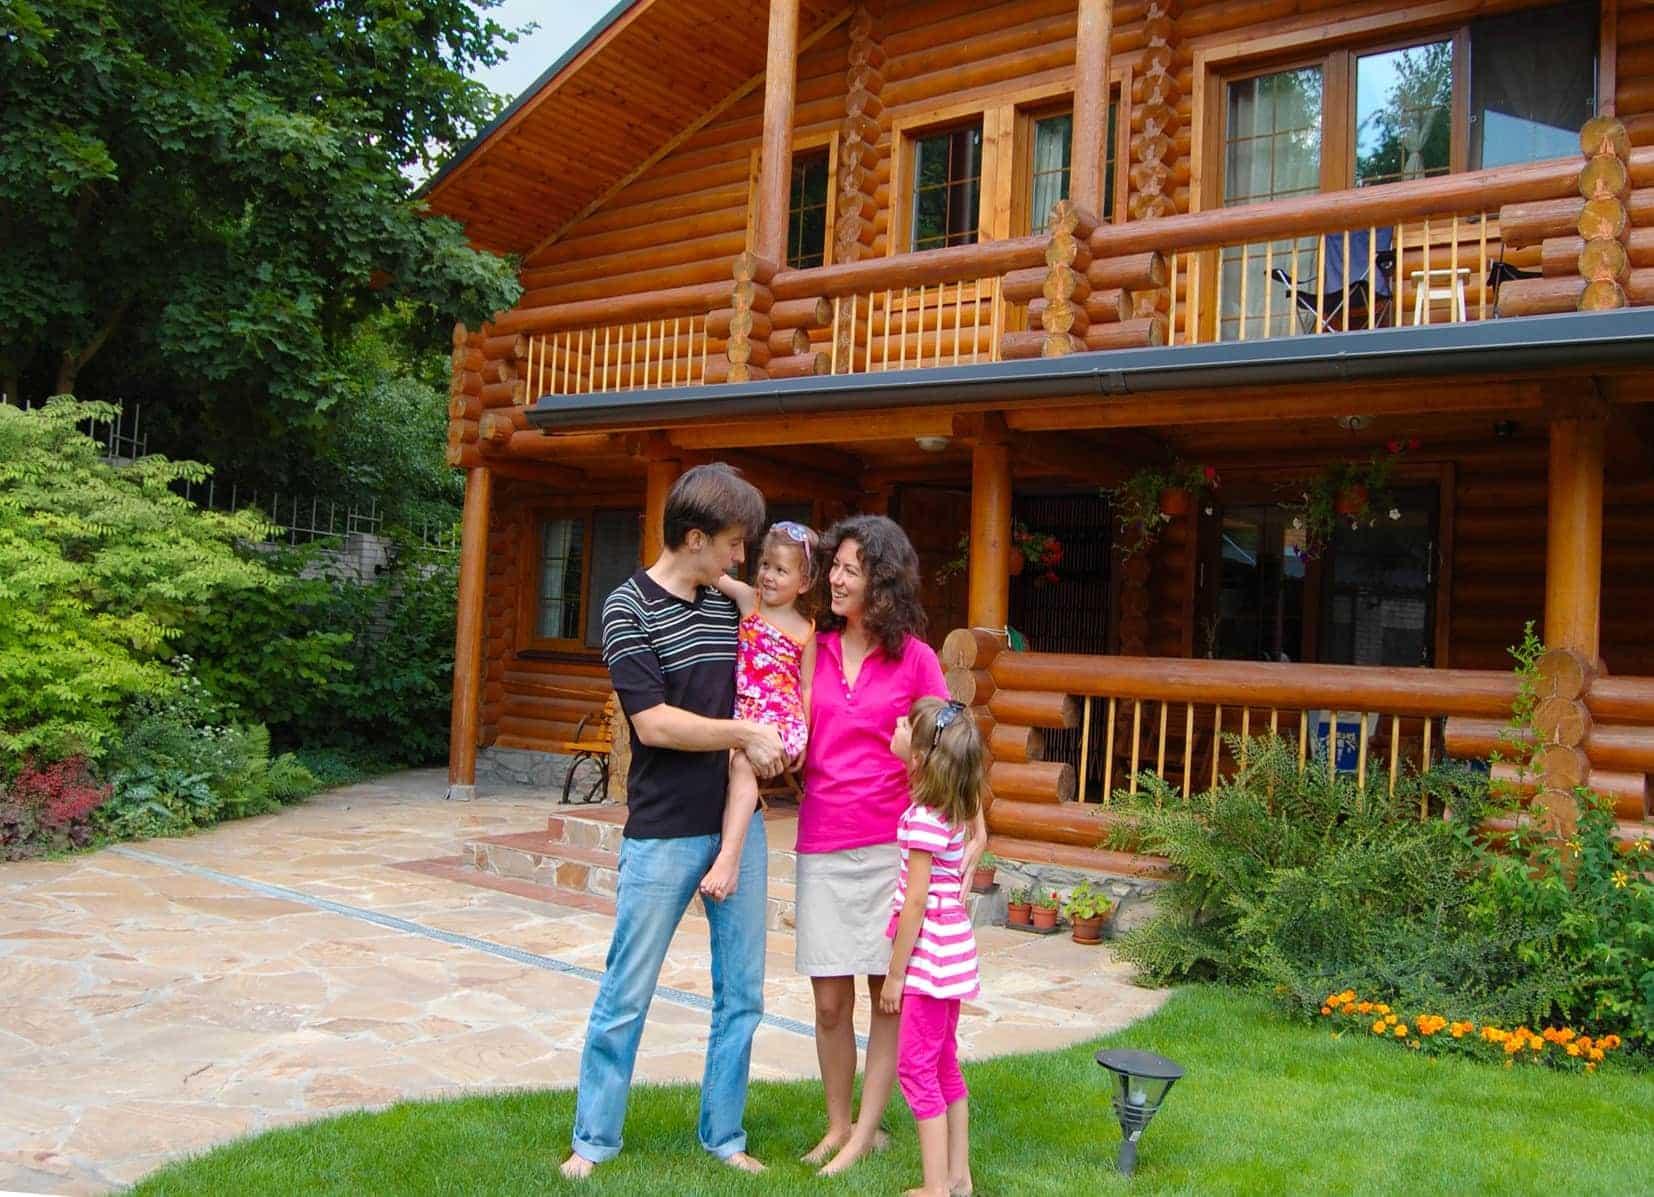 Прописка ребенка в частном доме МСК